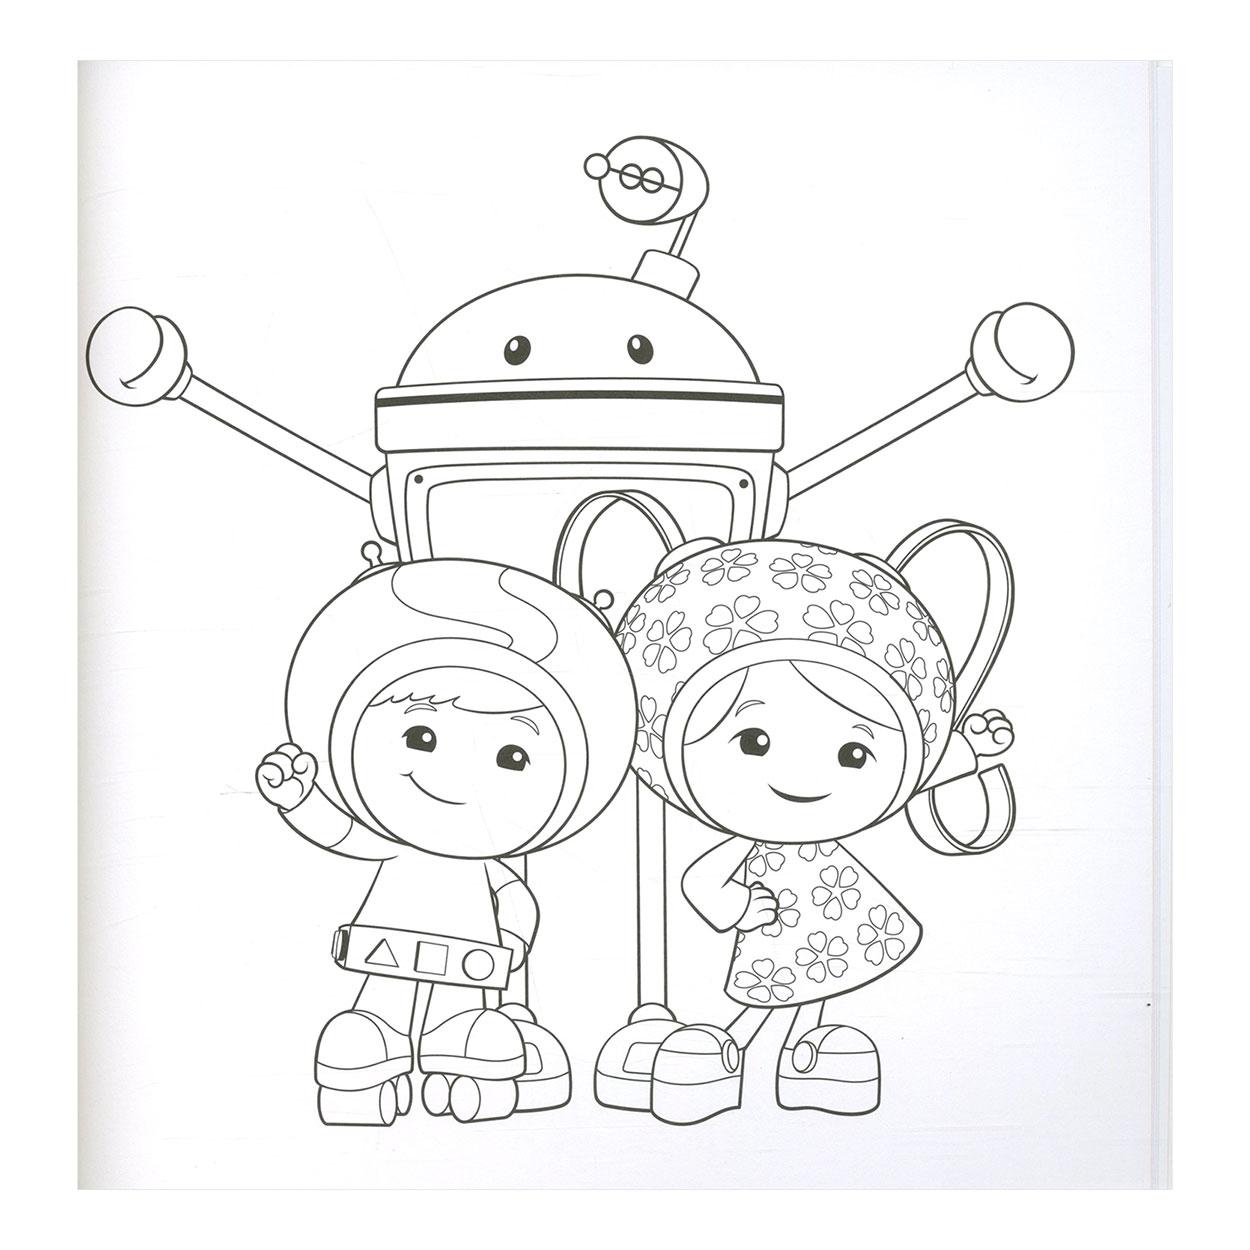 babyspeelgoed kleurplaat kidkleurplaat nl